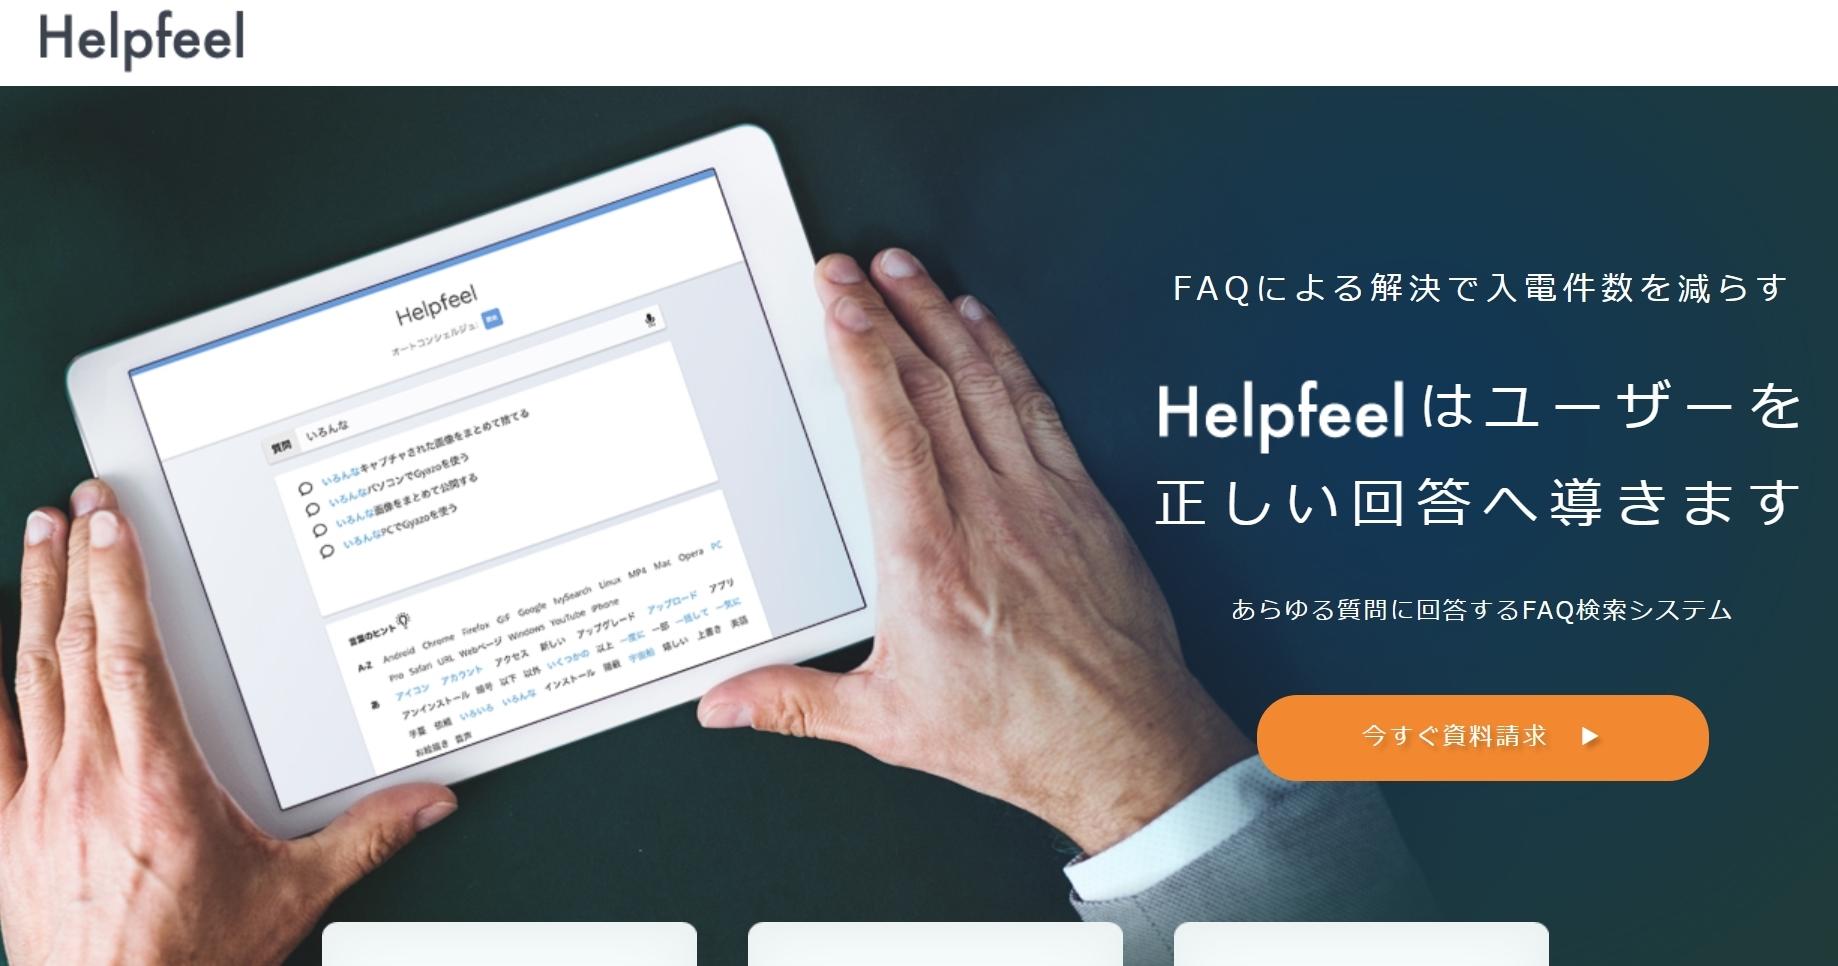 Helpfeelサービス紹介サイト